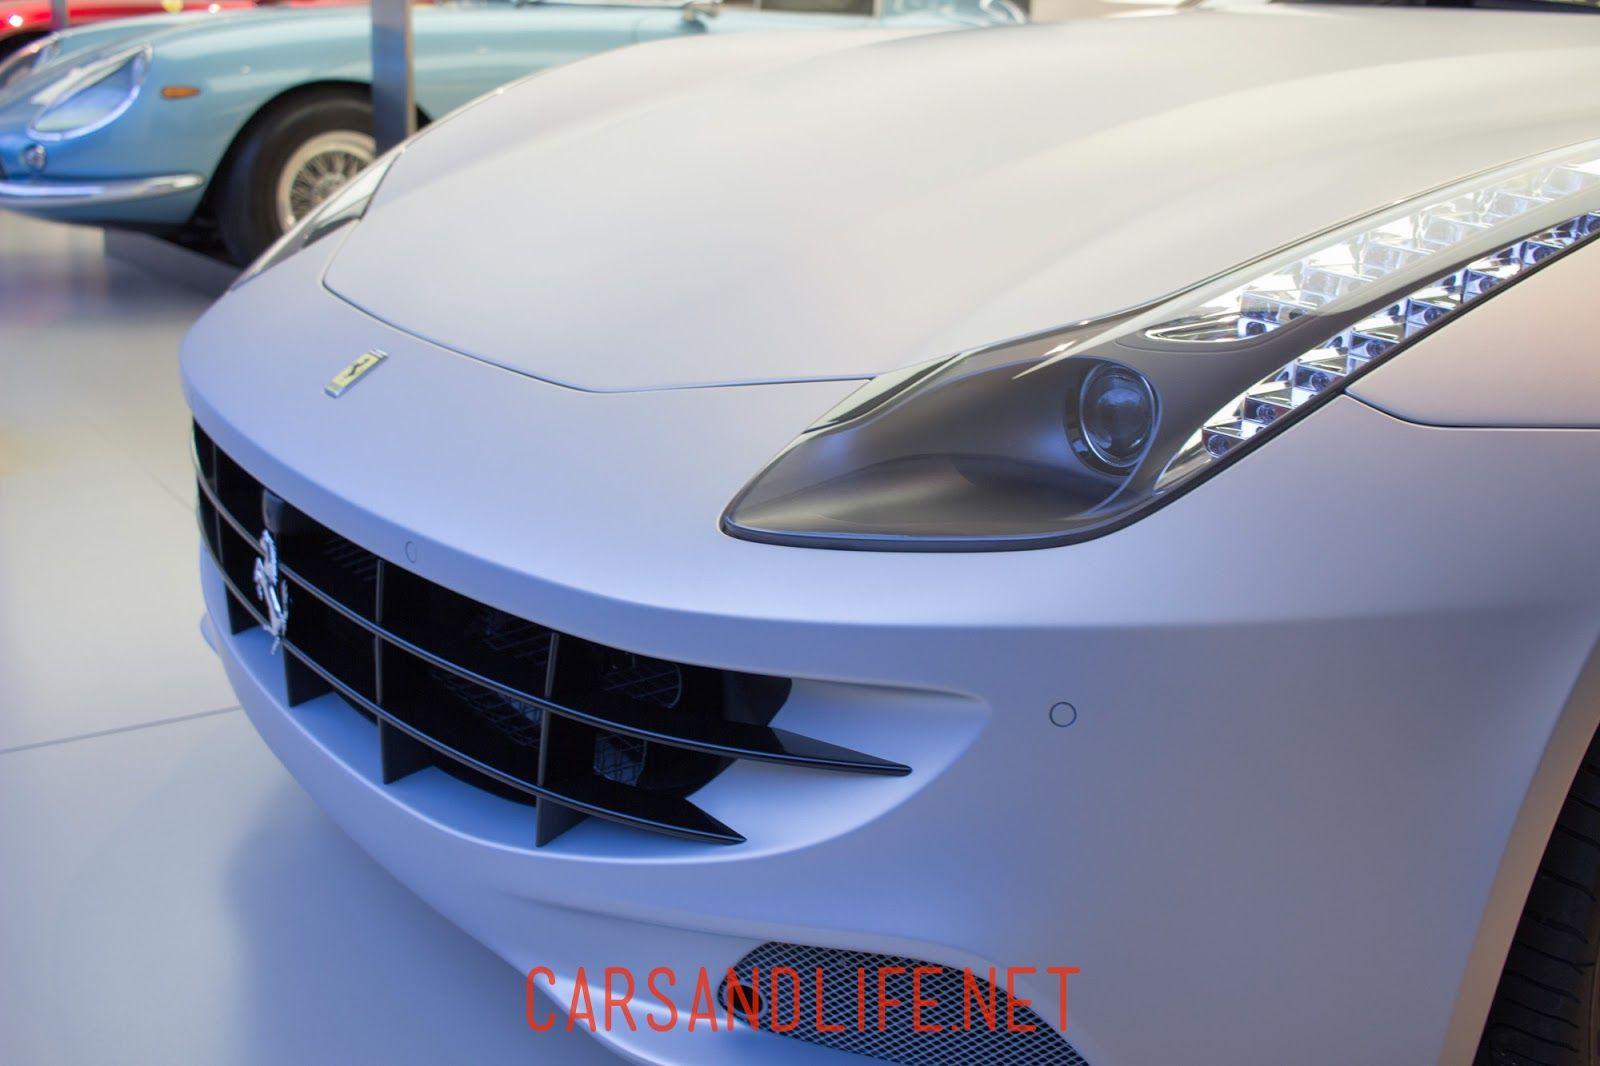 Cars & Life | Cars Fashion Lifestyle Blog: Ferrari FF at Knightsbridge London | HR Owen